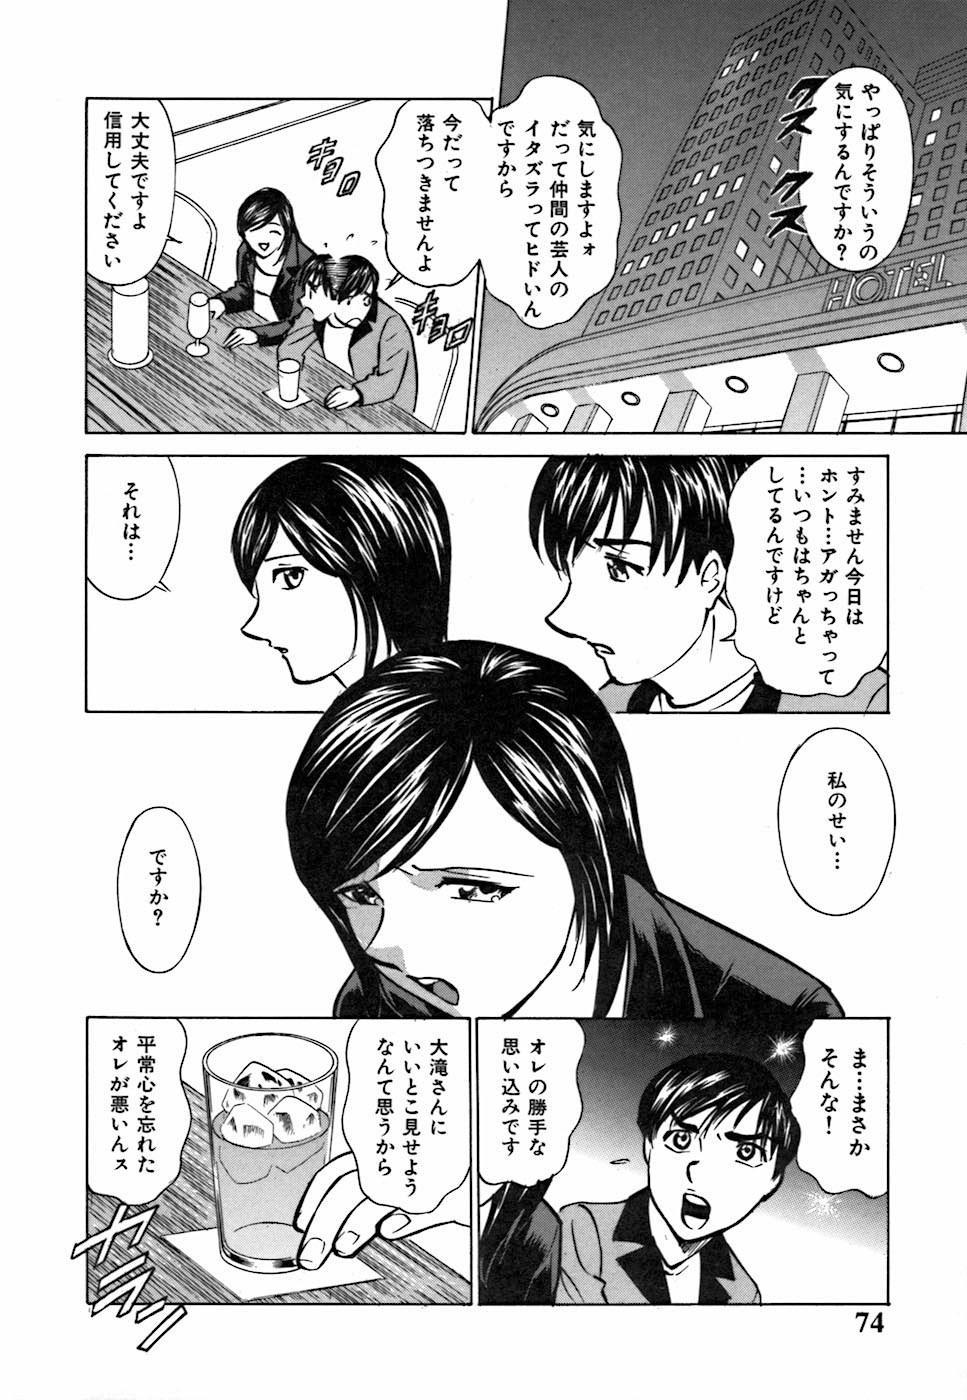 Kimi ga Nozomu Katachi | Appearance for which you hope 73